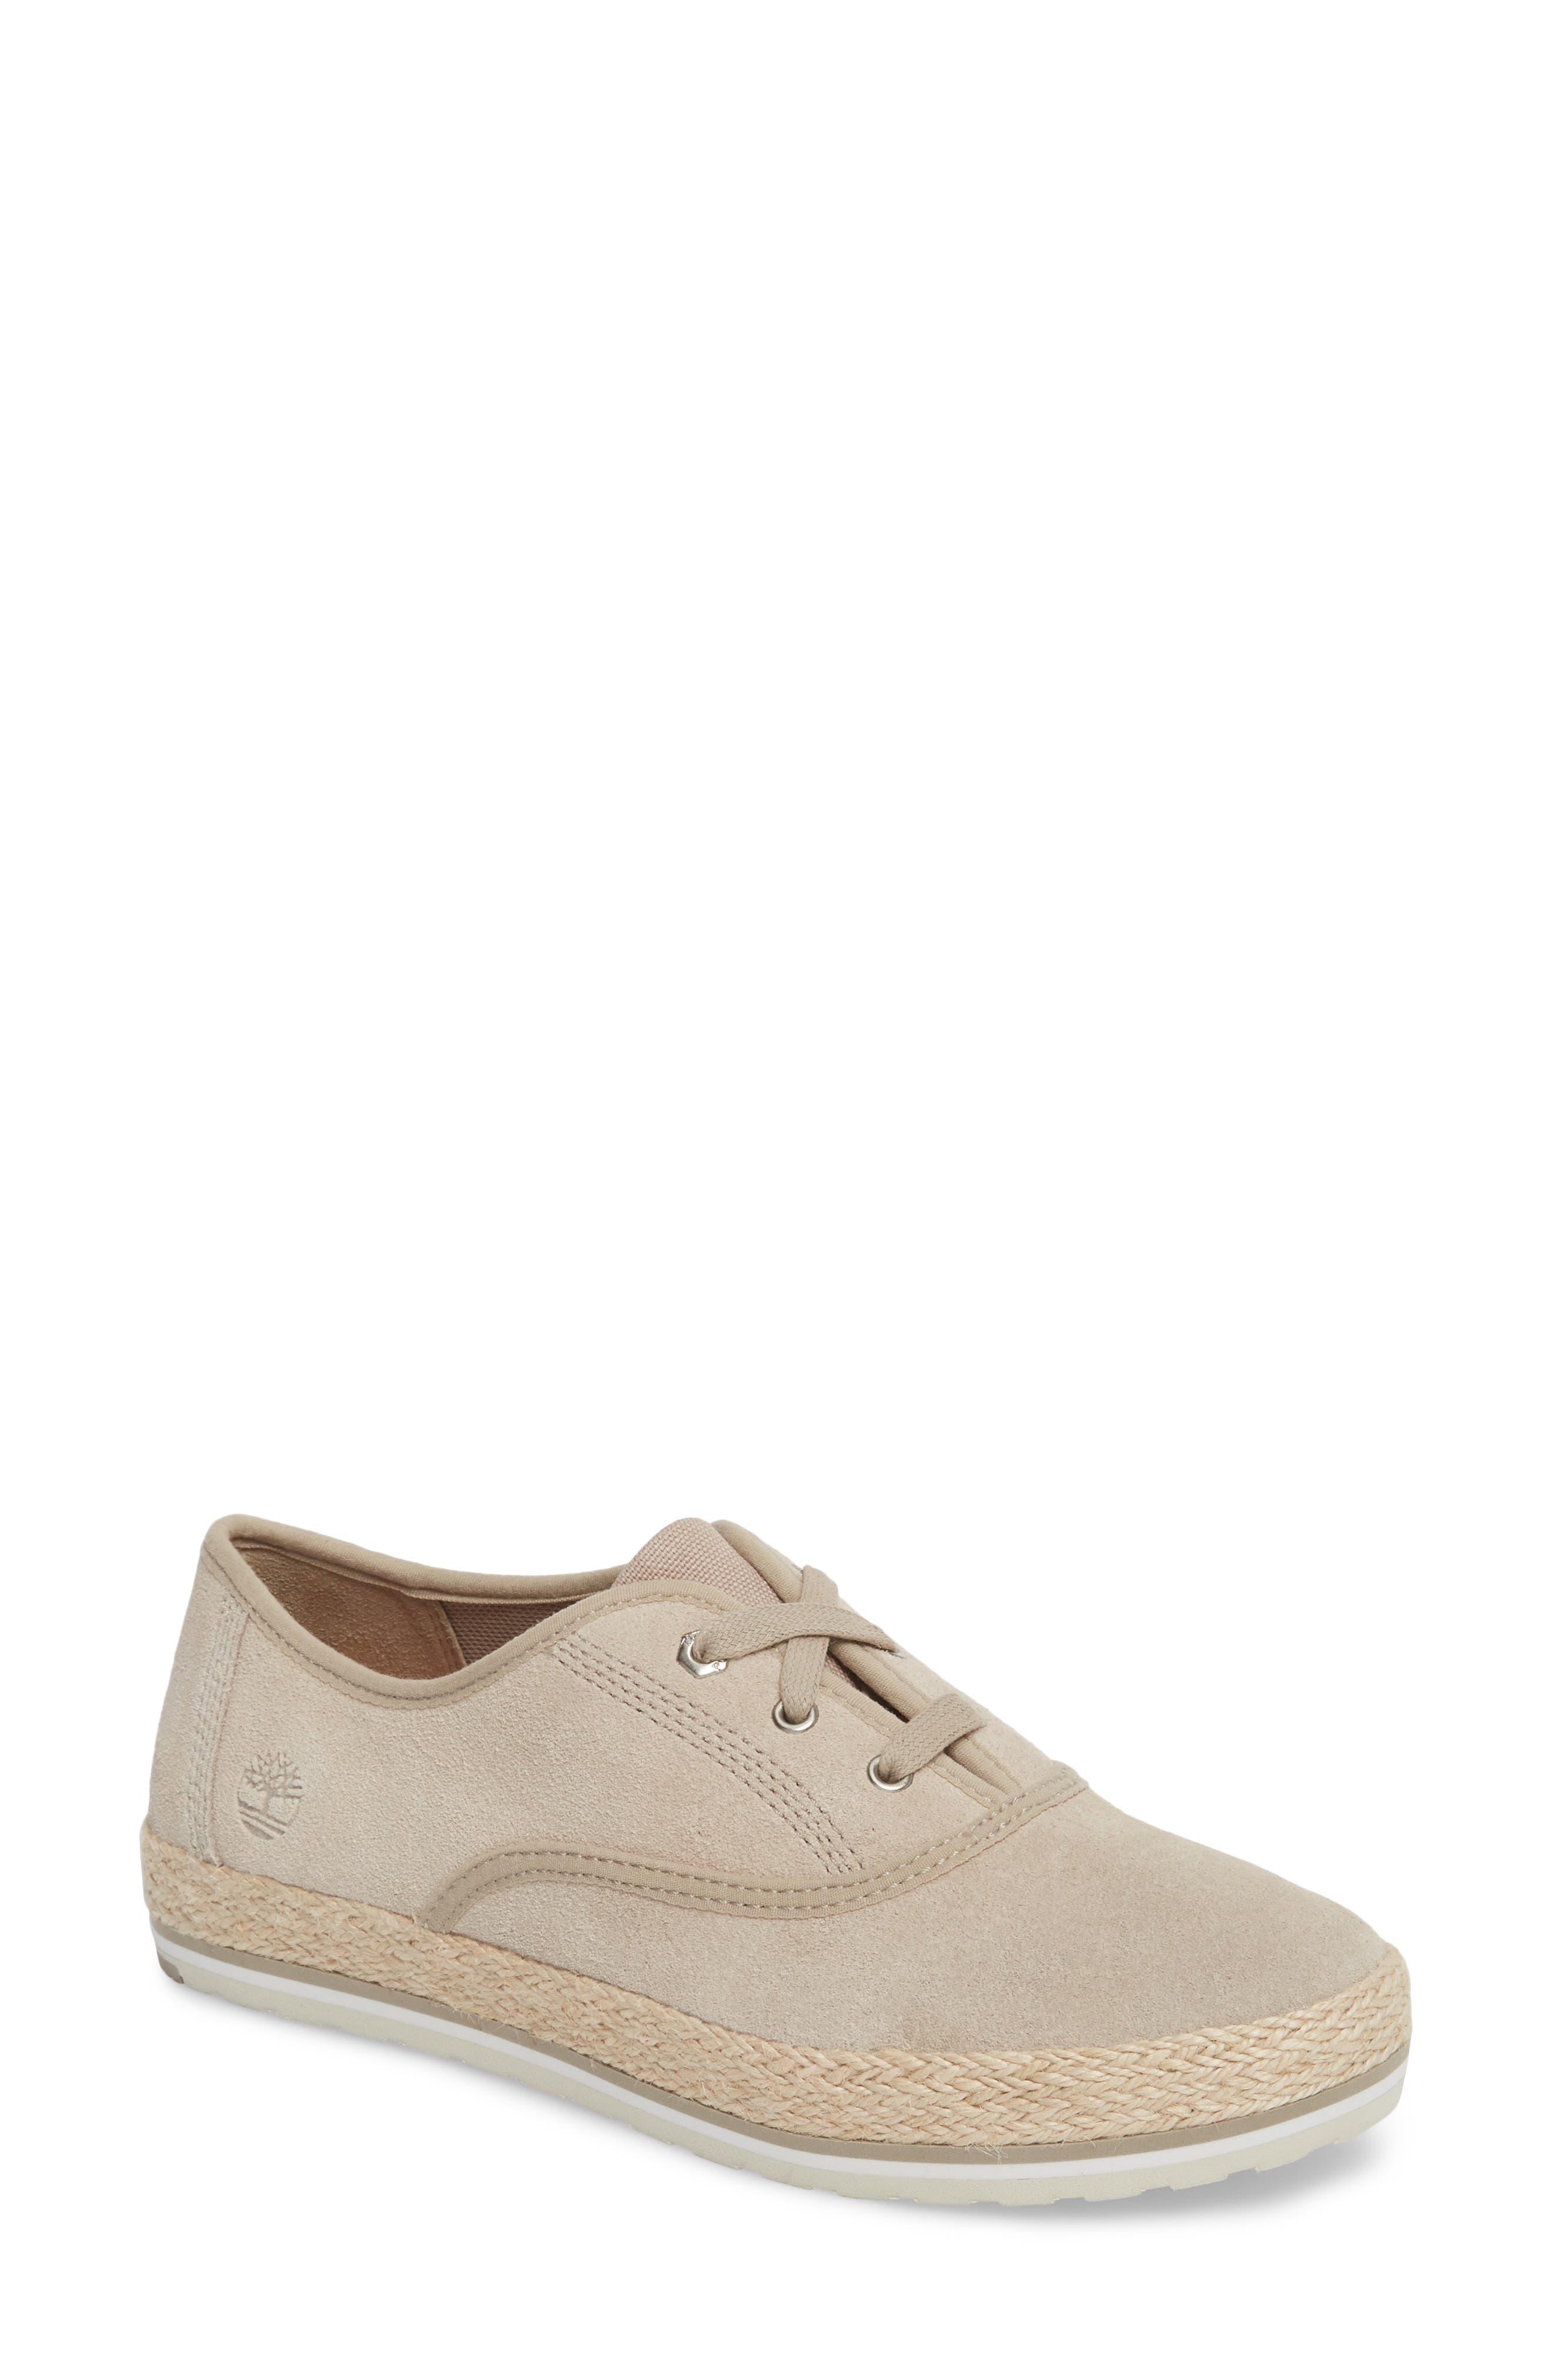 Eivissa Sea Oxford Sneaker,                             Main thumbnail 1, color,                             270